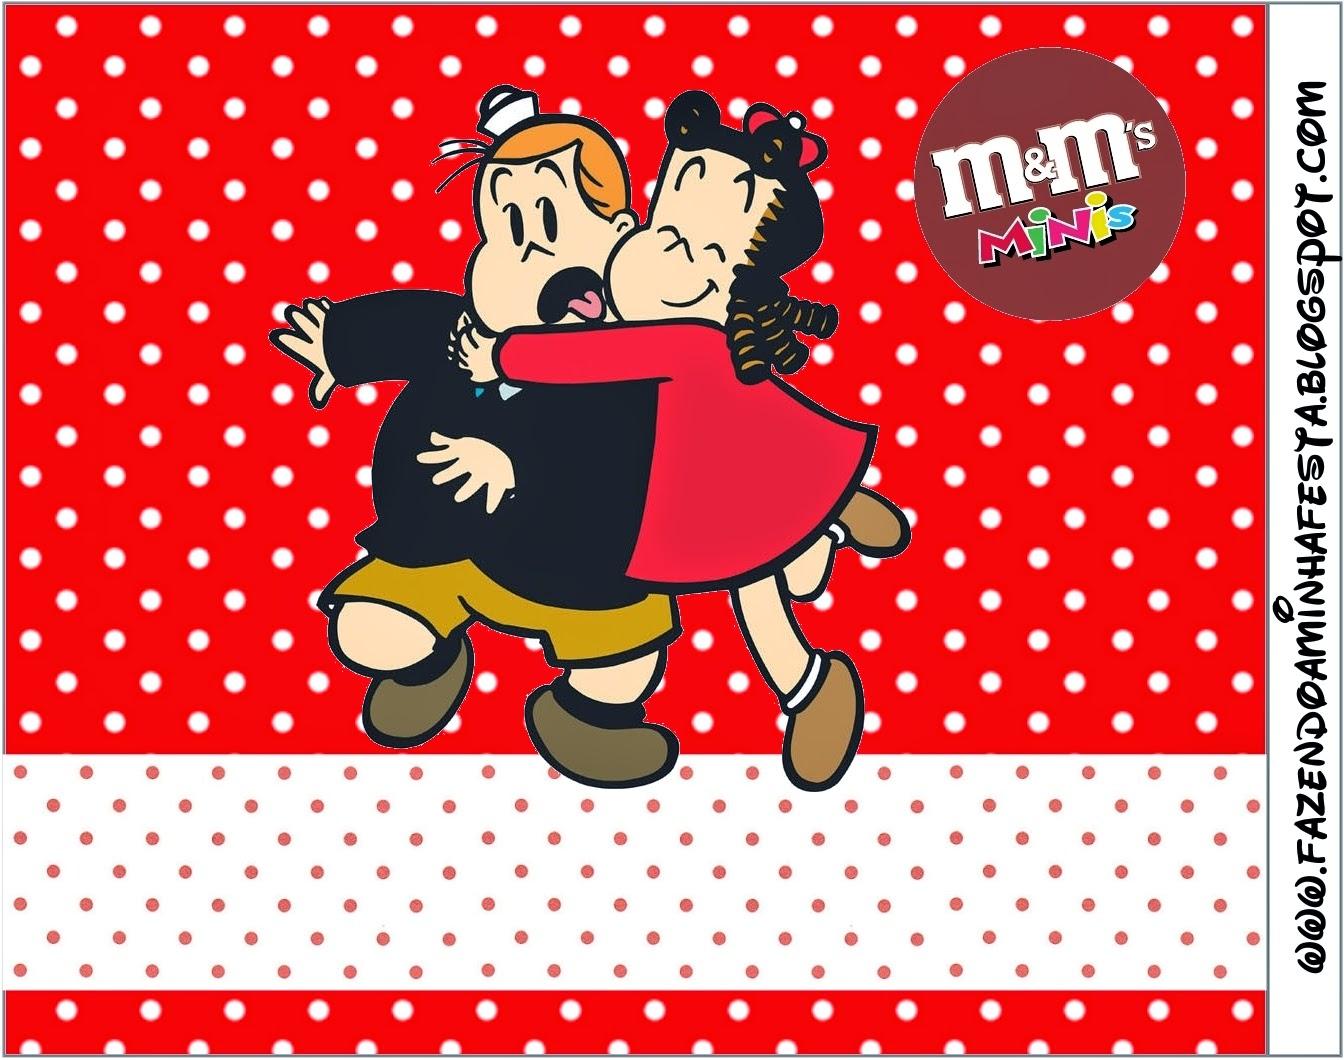 Etiqueta M&M para Imprimir Gratis de La Pequeña Lulú.